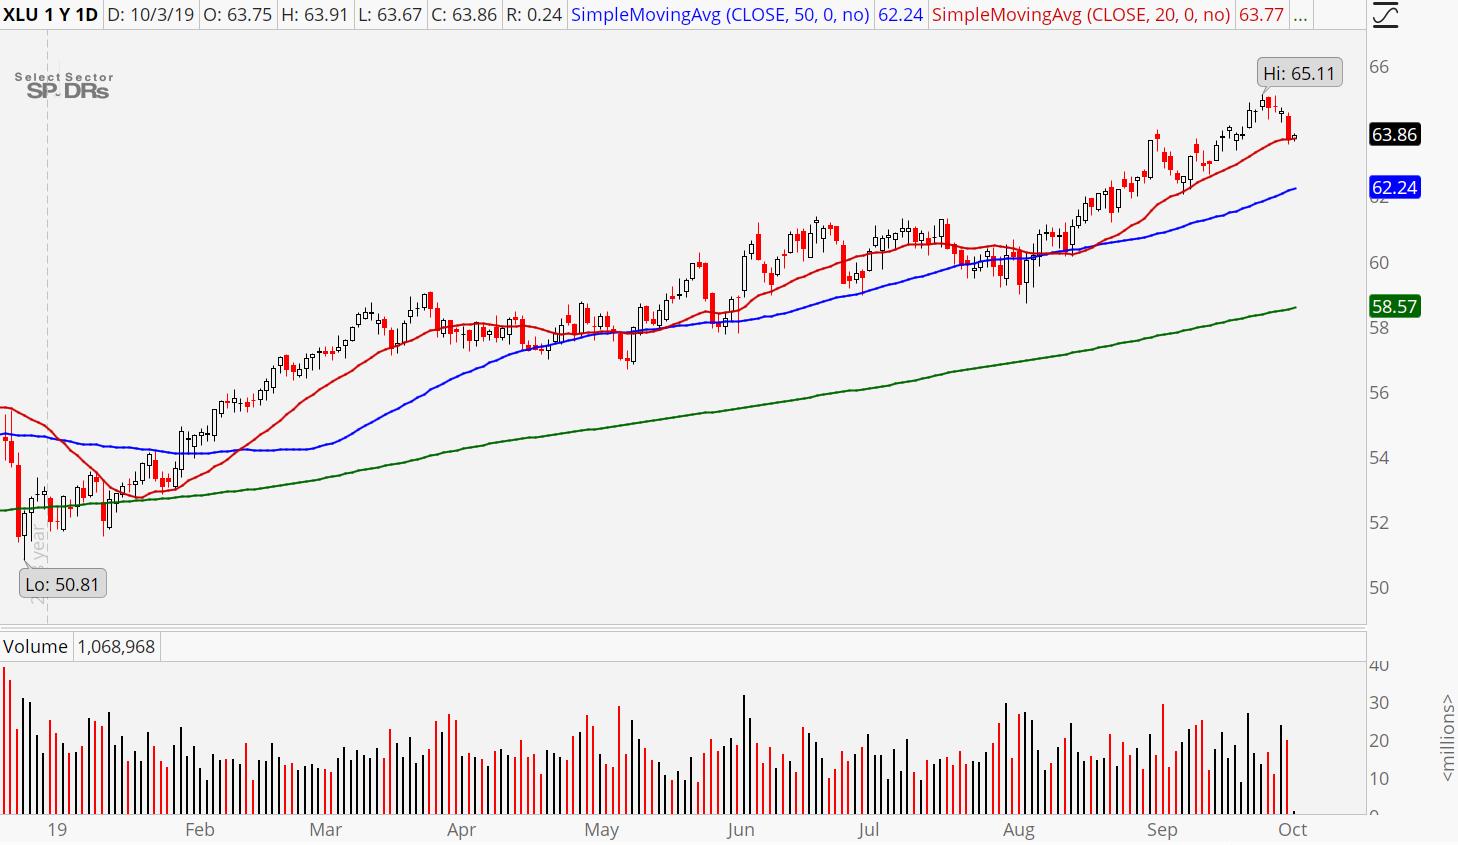 3 Safe Stocks to Buy: Utilities Sector (XLU)